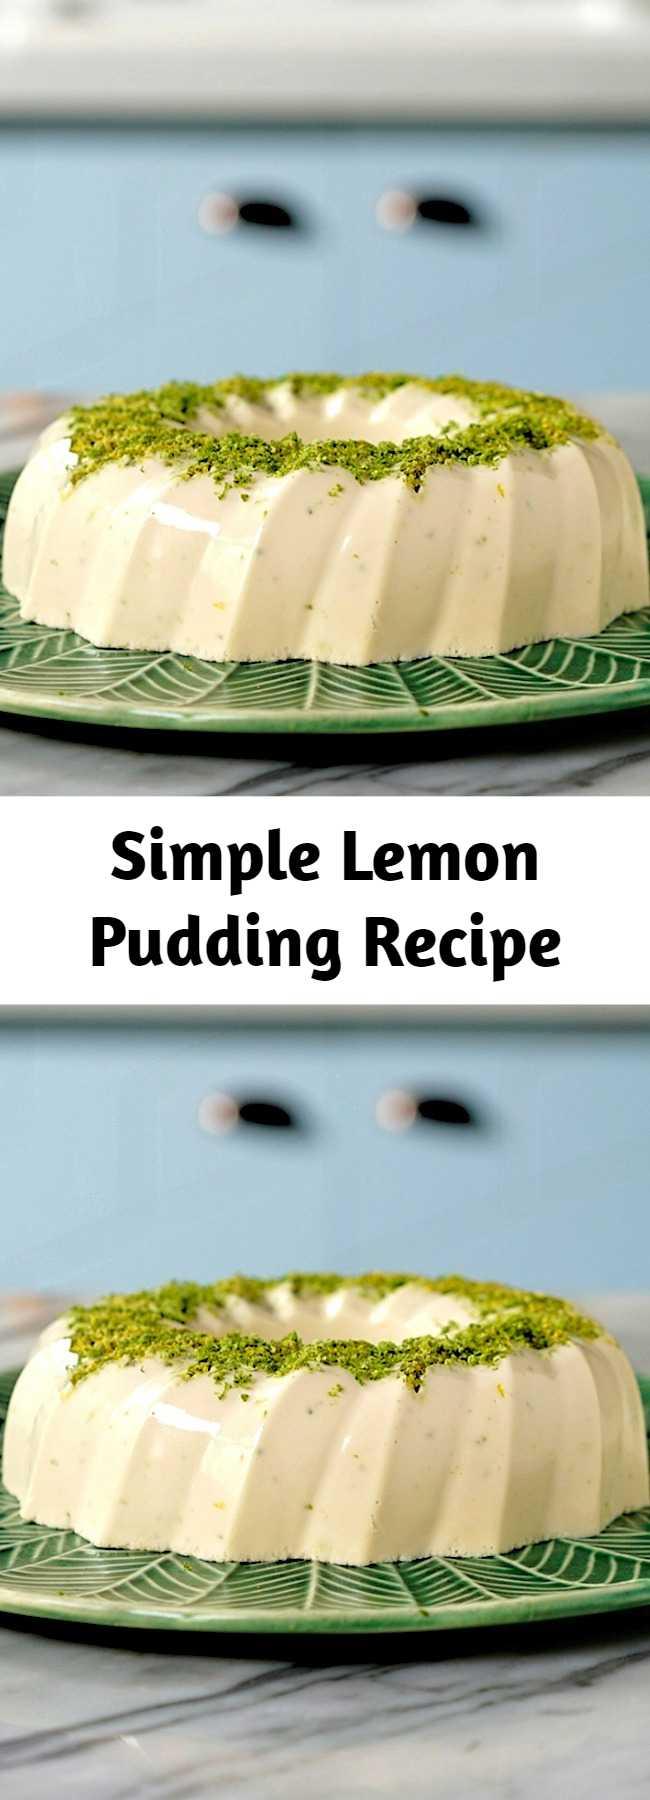 Simple Lemon Pudding Recipe